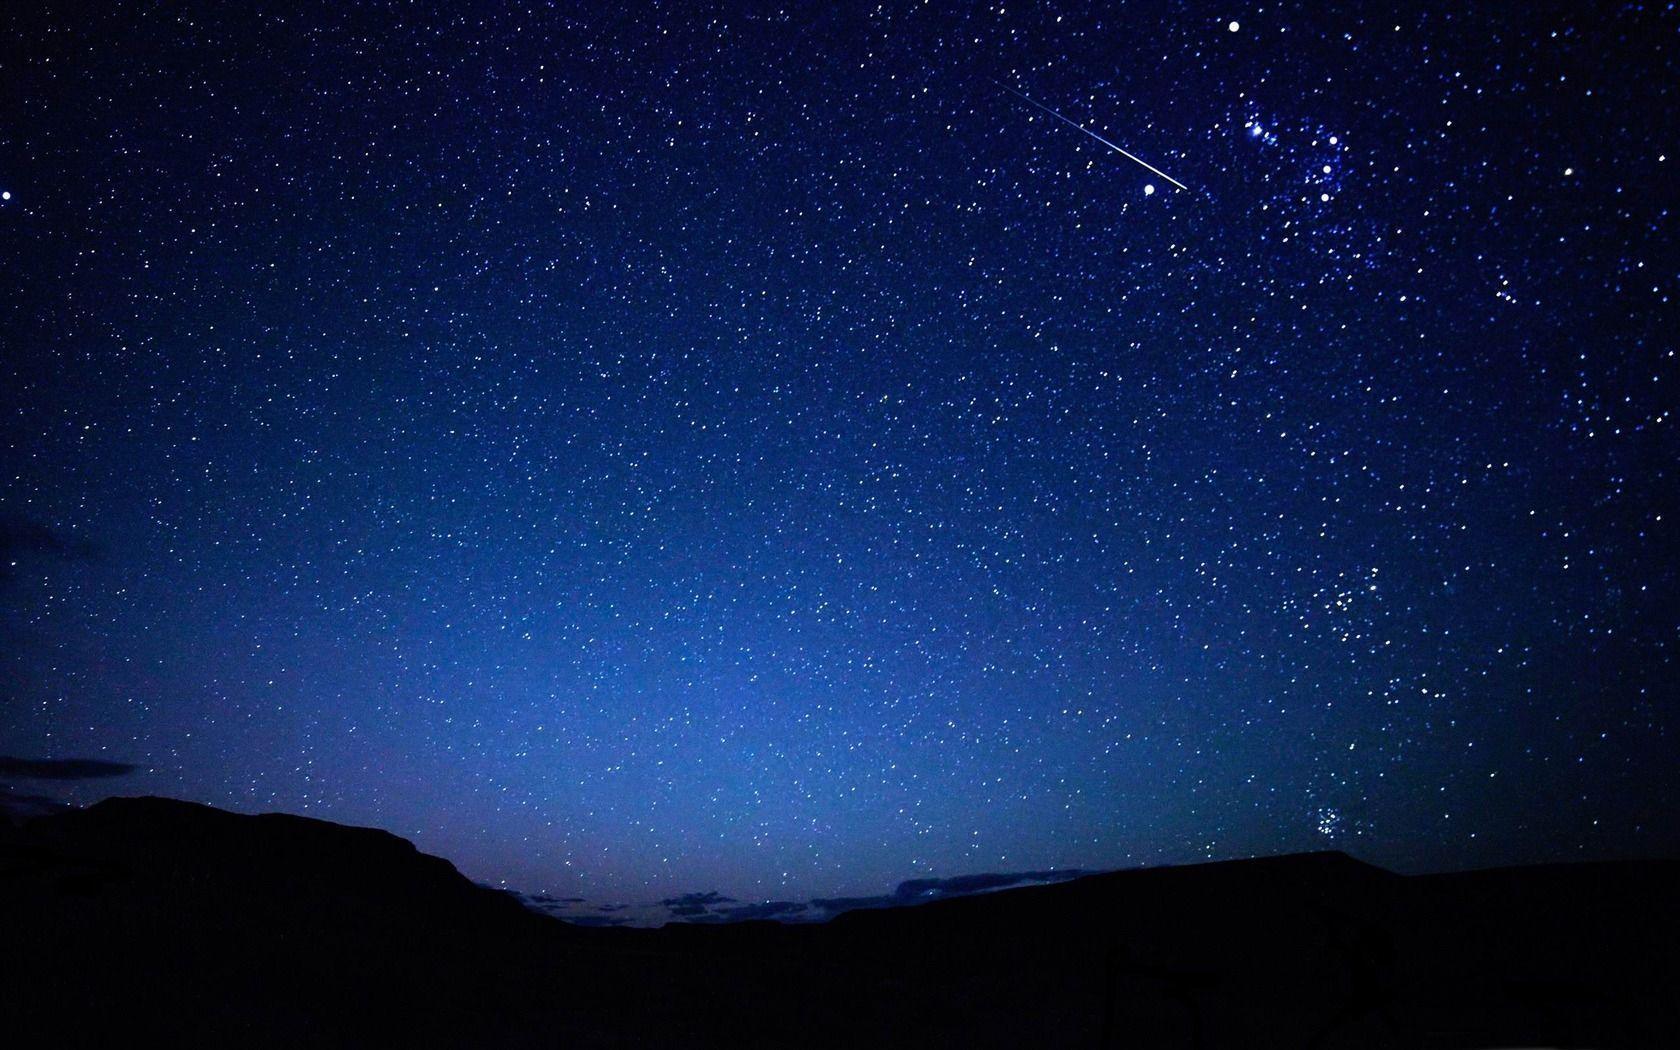 Night Sky Stars Wallpapers Top Free Night Sky Stars Backgrounds